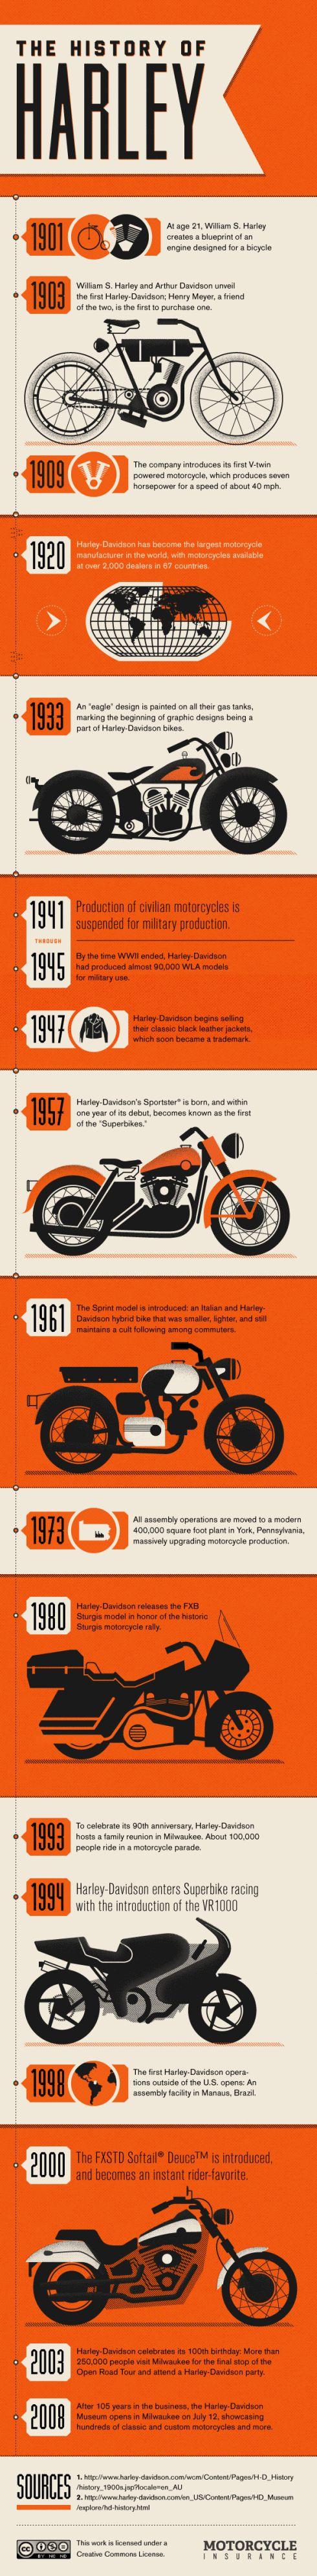 Unique Infographic Design, The History Of Harley via @bbvcoverlover #Infographic #Design #Harley-Davidson